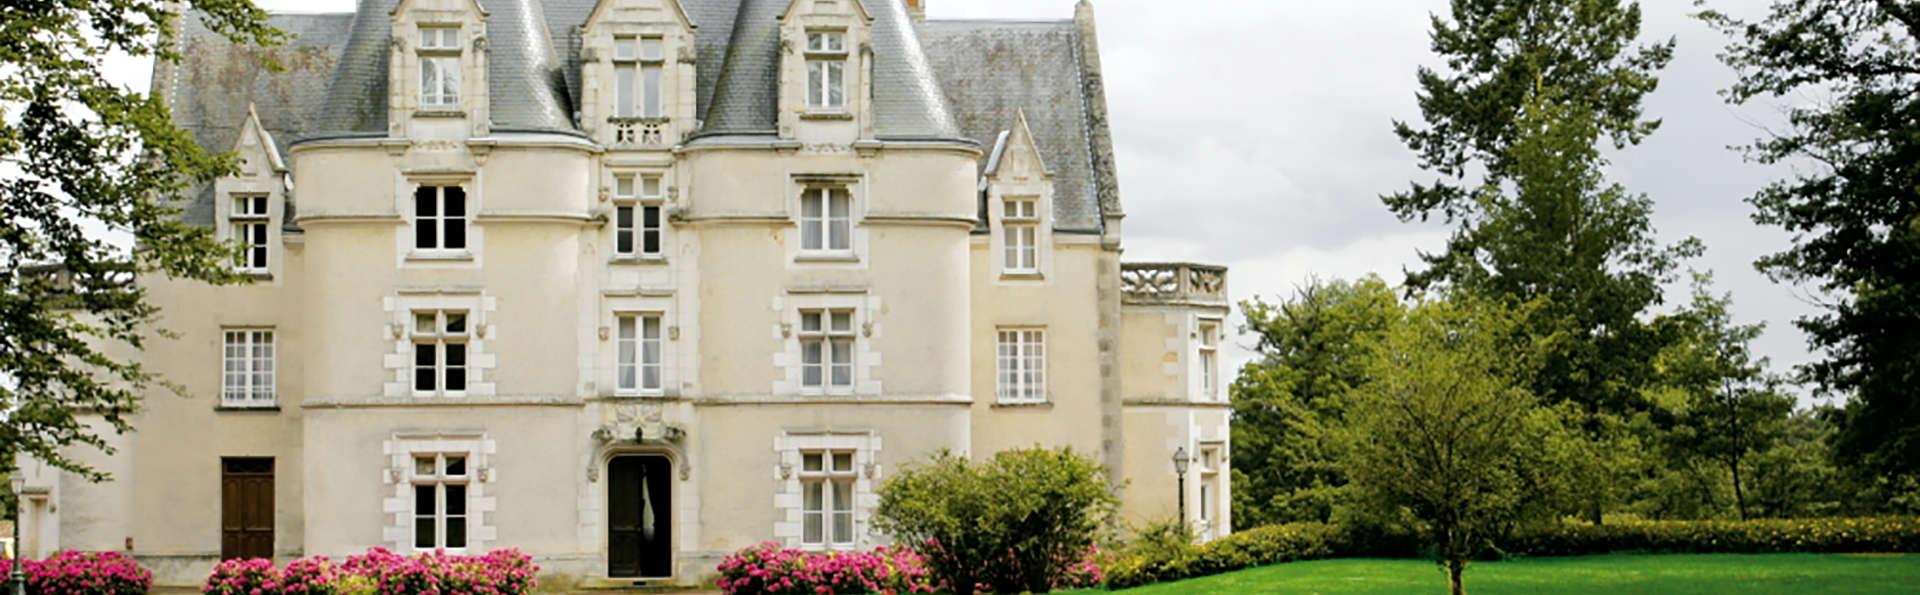 Château de Périgny  - EDIT_chateau.jpg